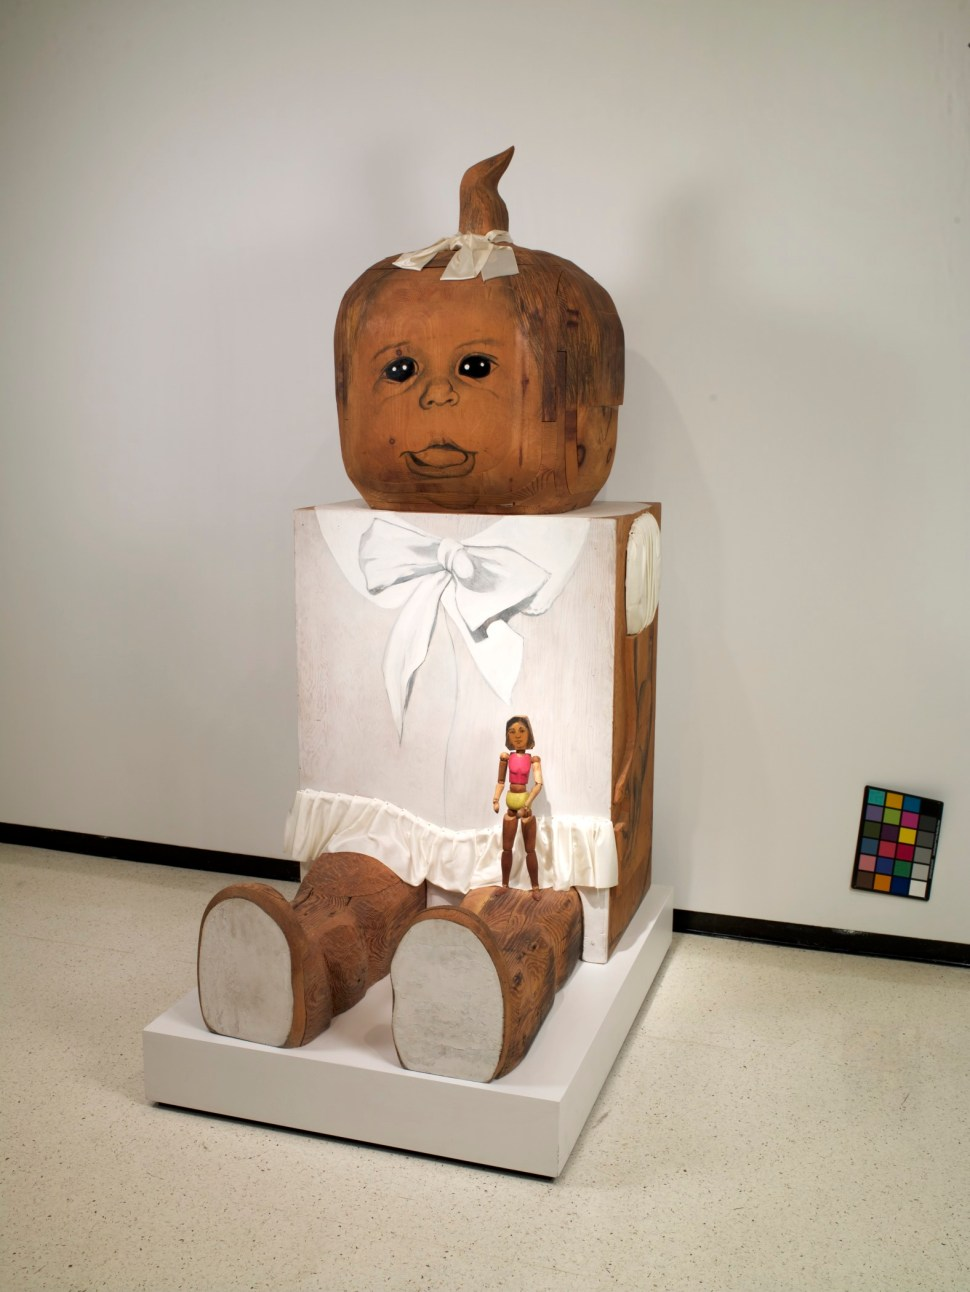 Marisol Baby Girl, 1963 Albright-Knox Art Gallery New York